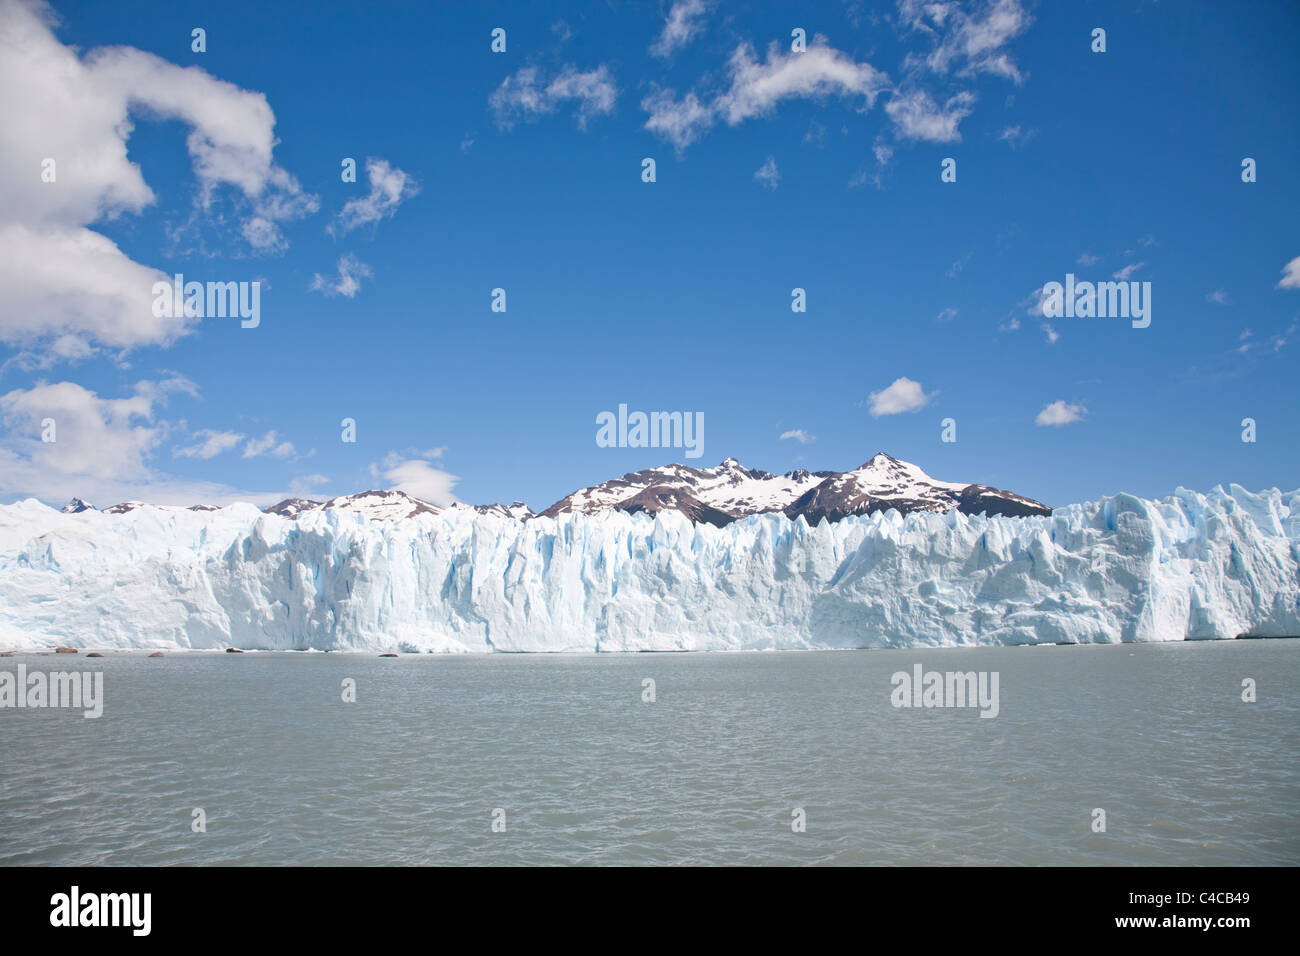 Perito Moreno Glaciar, Patagonia Argentina - Stock Image